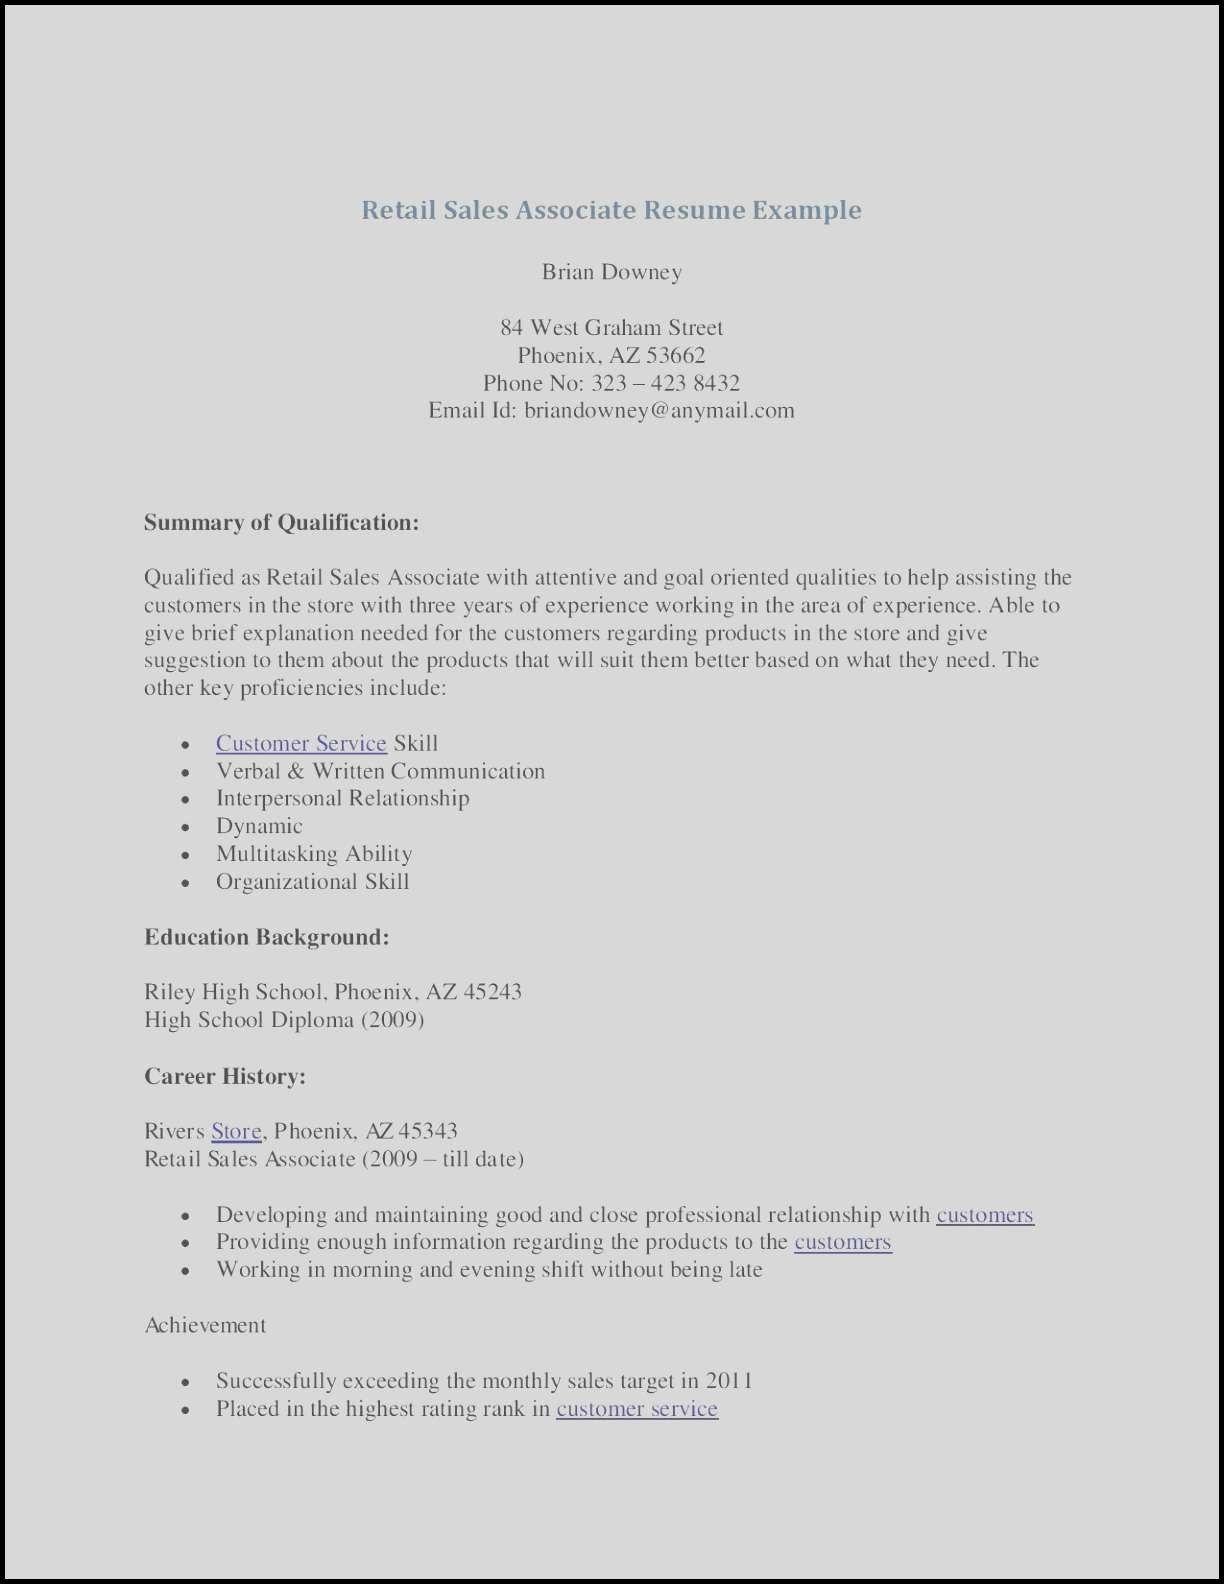 Sales Associate Resume Examples Retail Sales Resume Sample Lovely Retail Resume Examples Best Resu Sales Resume Examples Resume Examples Retail Resume Examples